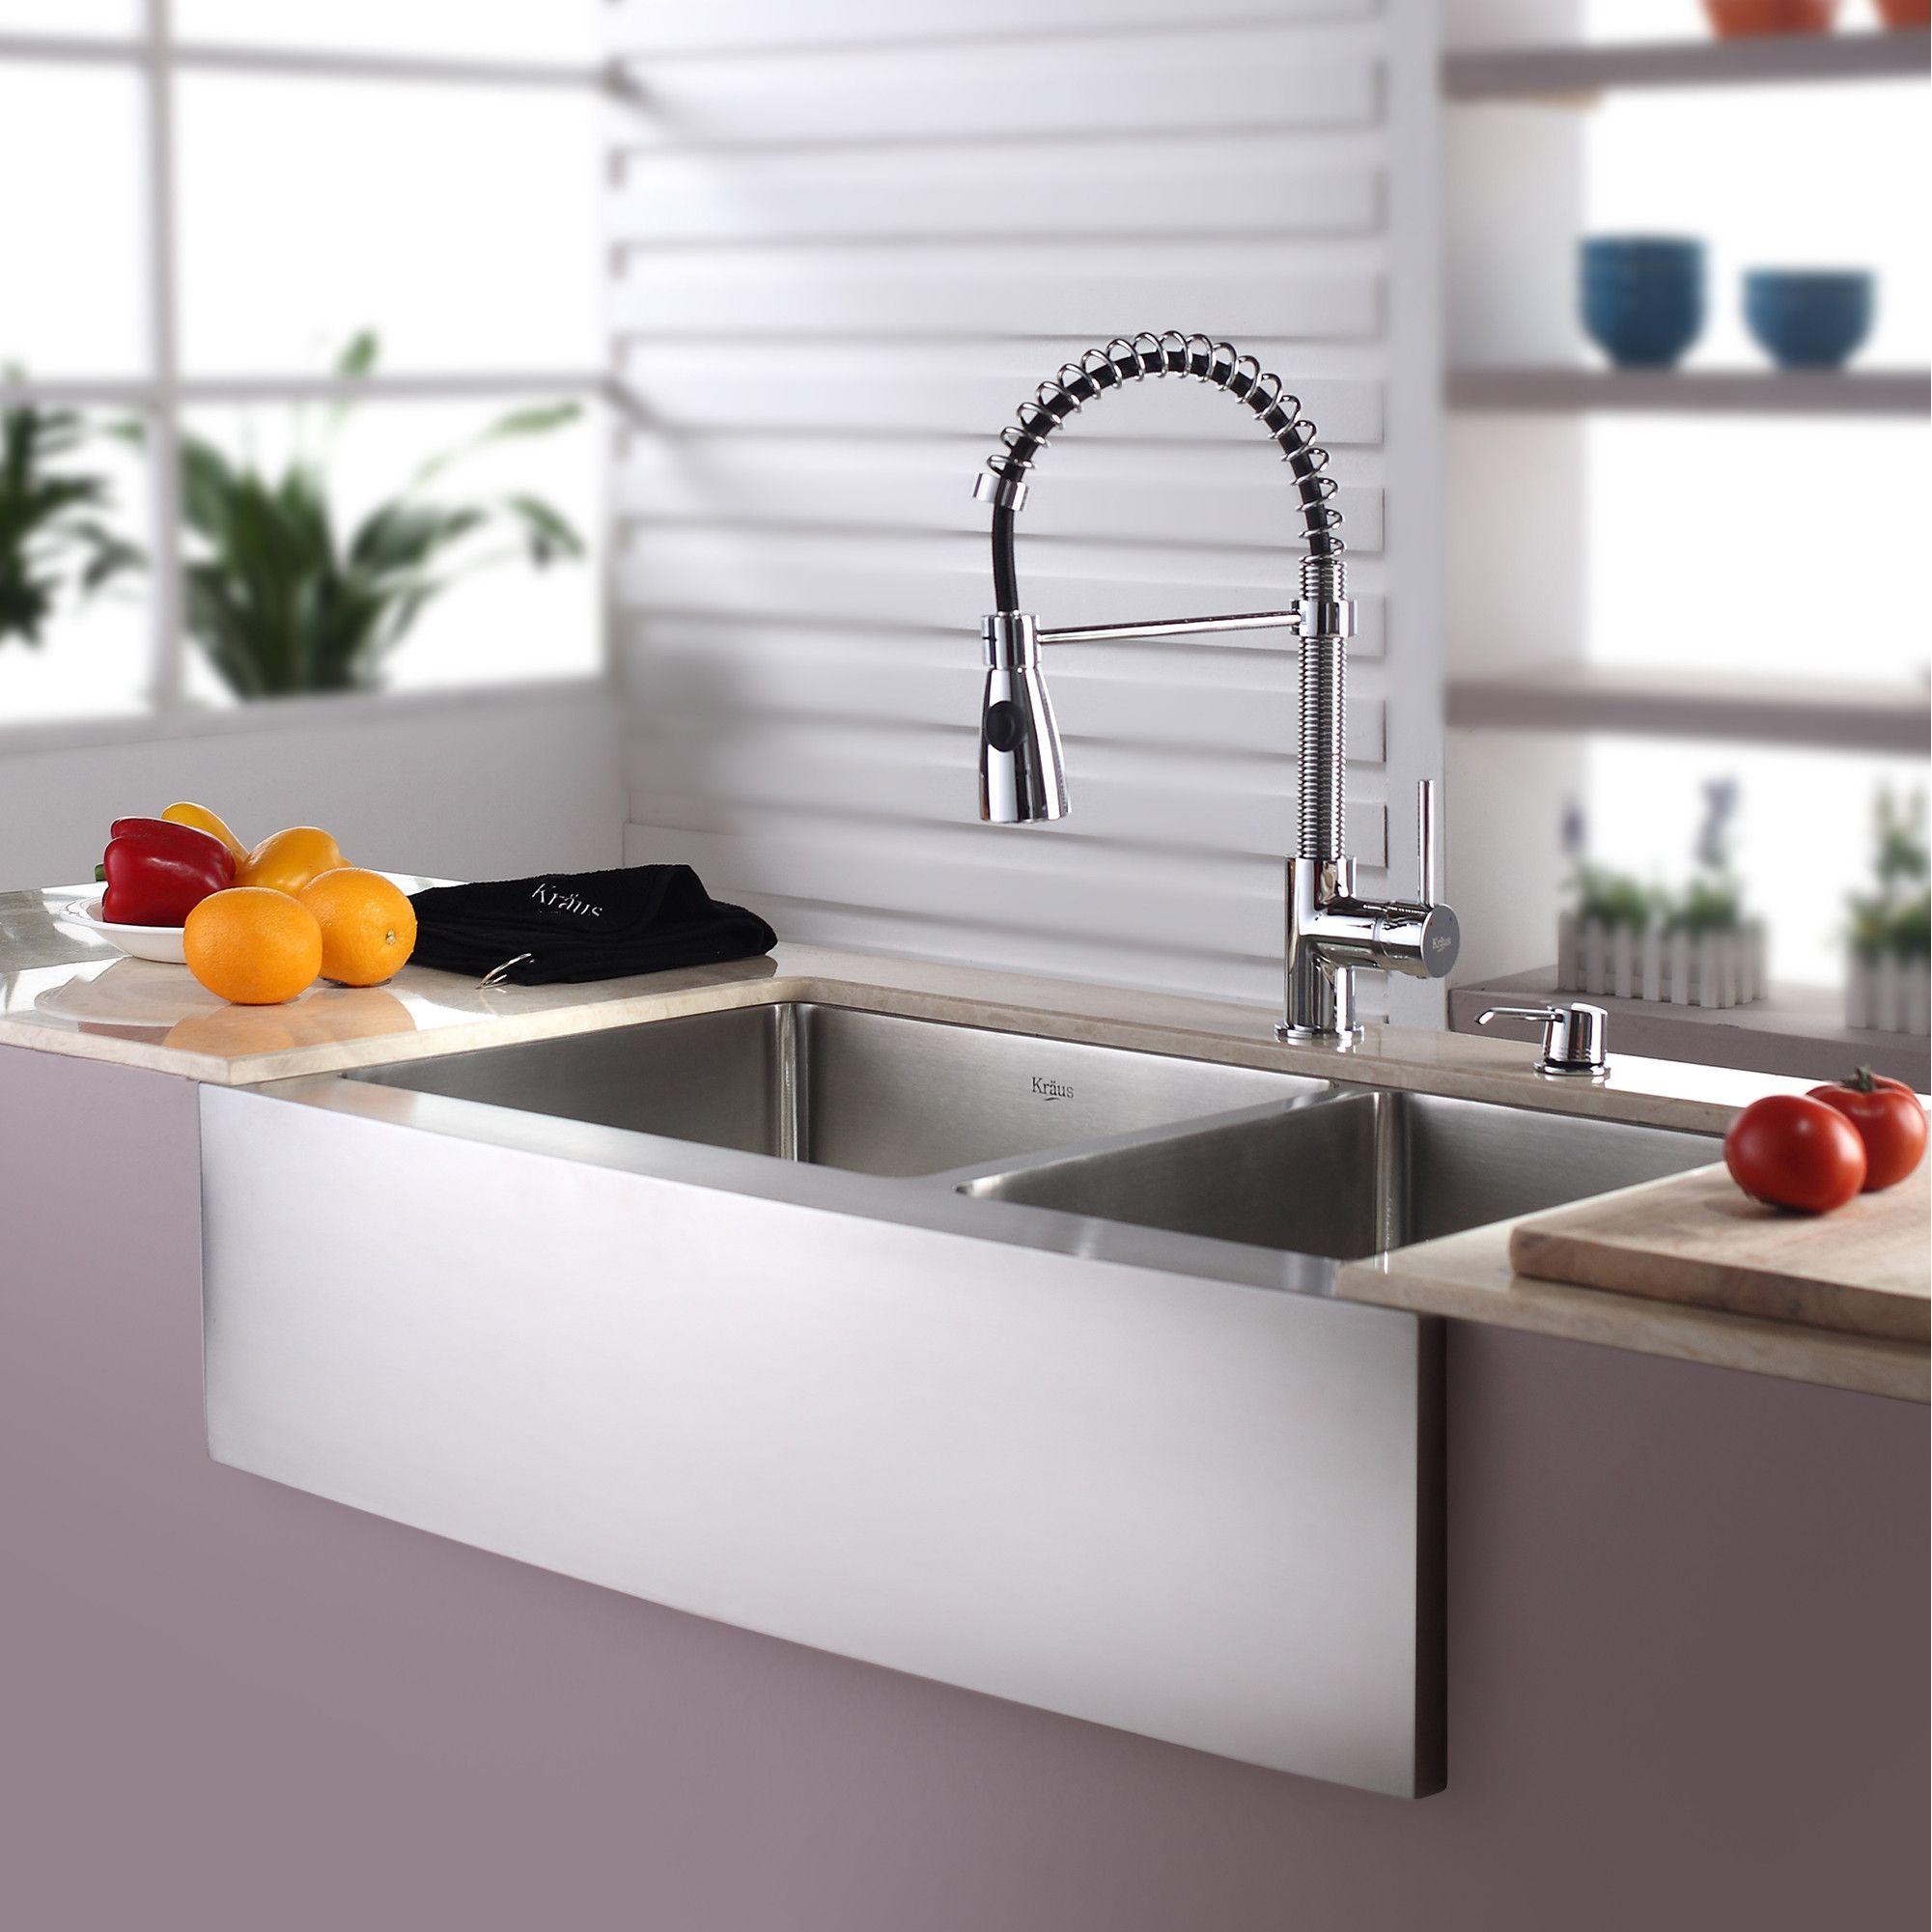 Kraus Farmhouse Sink 33.Kitchen Combos 33 L X 21 W Double Basin Farmhouse Apron